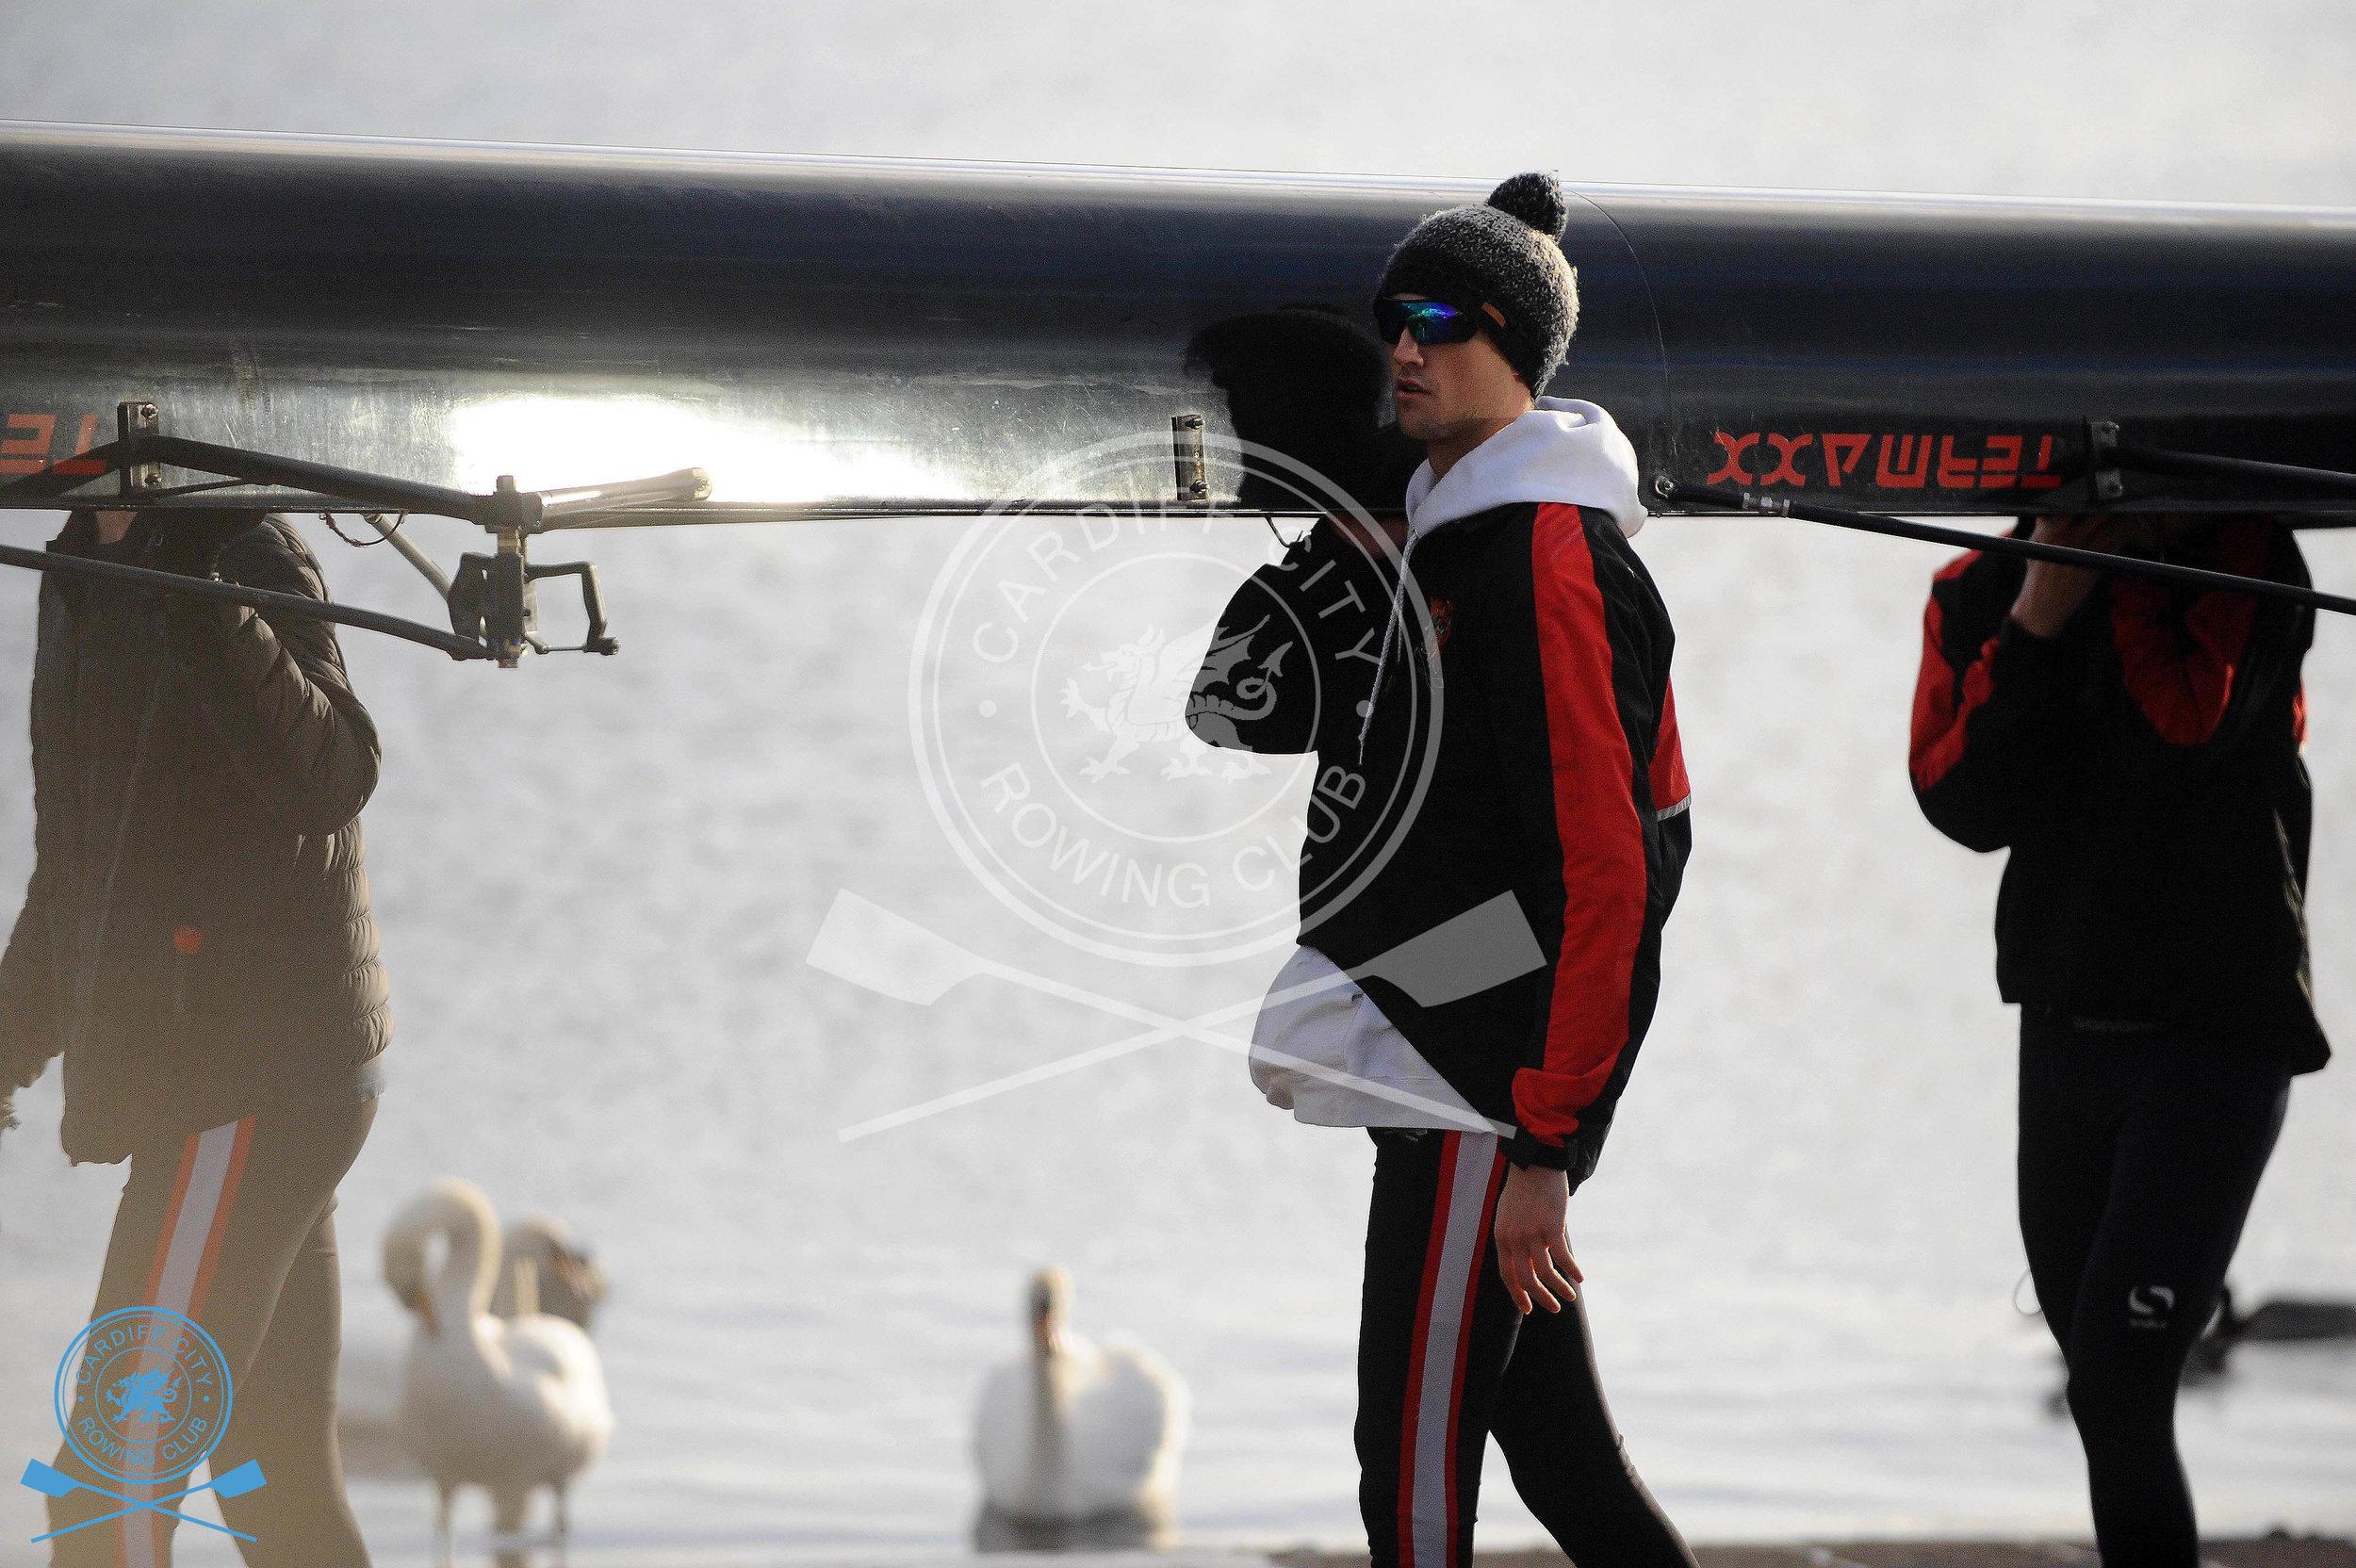 DW_280119_Cardiff_City_Rowing_49.jpg